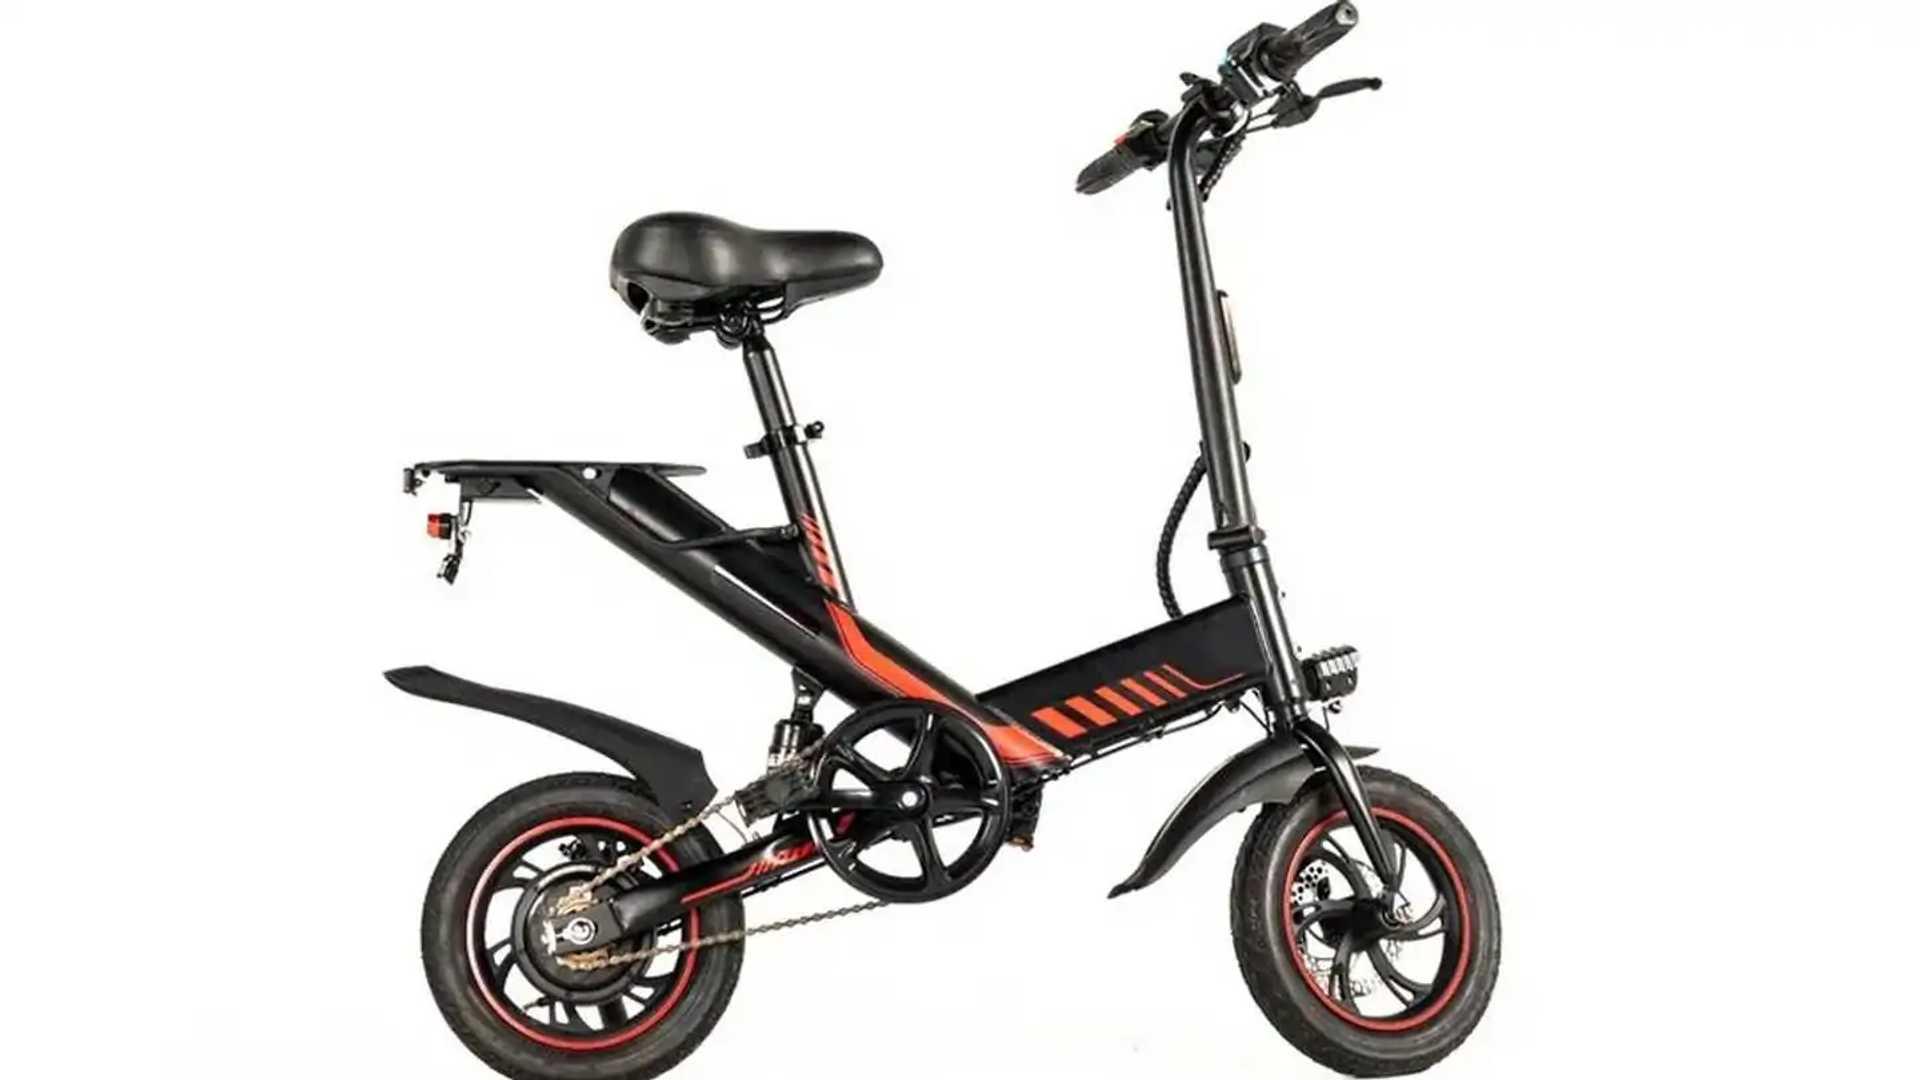 https://cdn.motor1.com/images/mgl/VRP4z/s6/bicicleta-eletrica.jpg